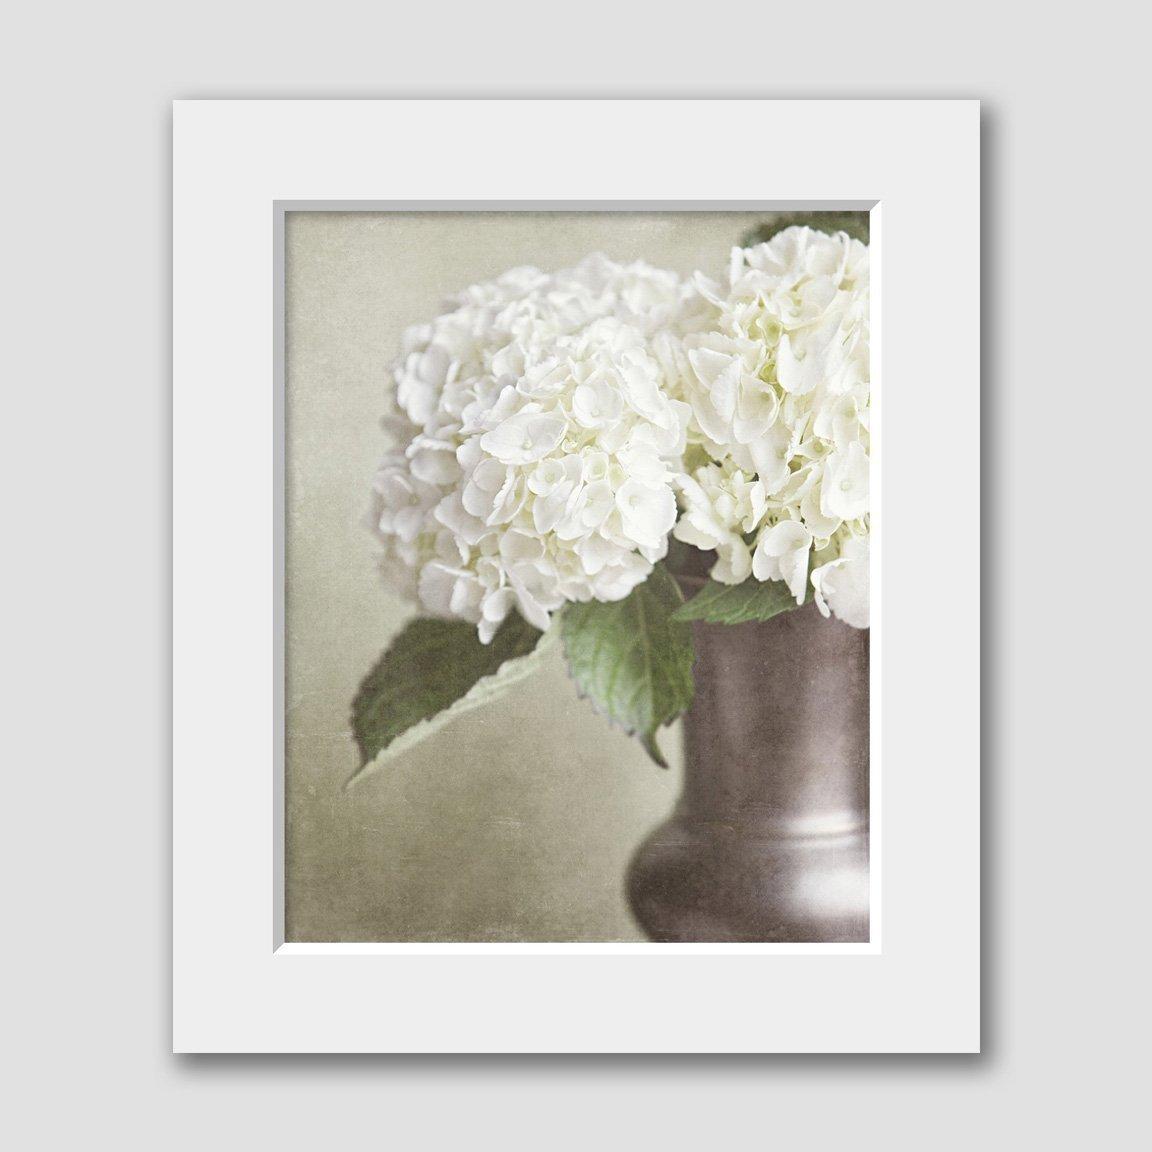 Botanical Hydrangea Matted 8x10 Print (fits 11x14 Frame). Shabby Chic Neutral Home Decor.